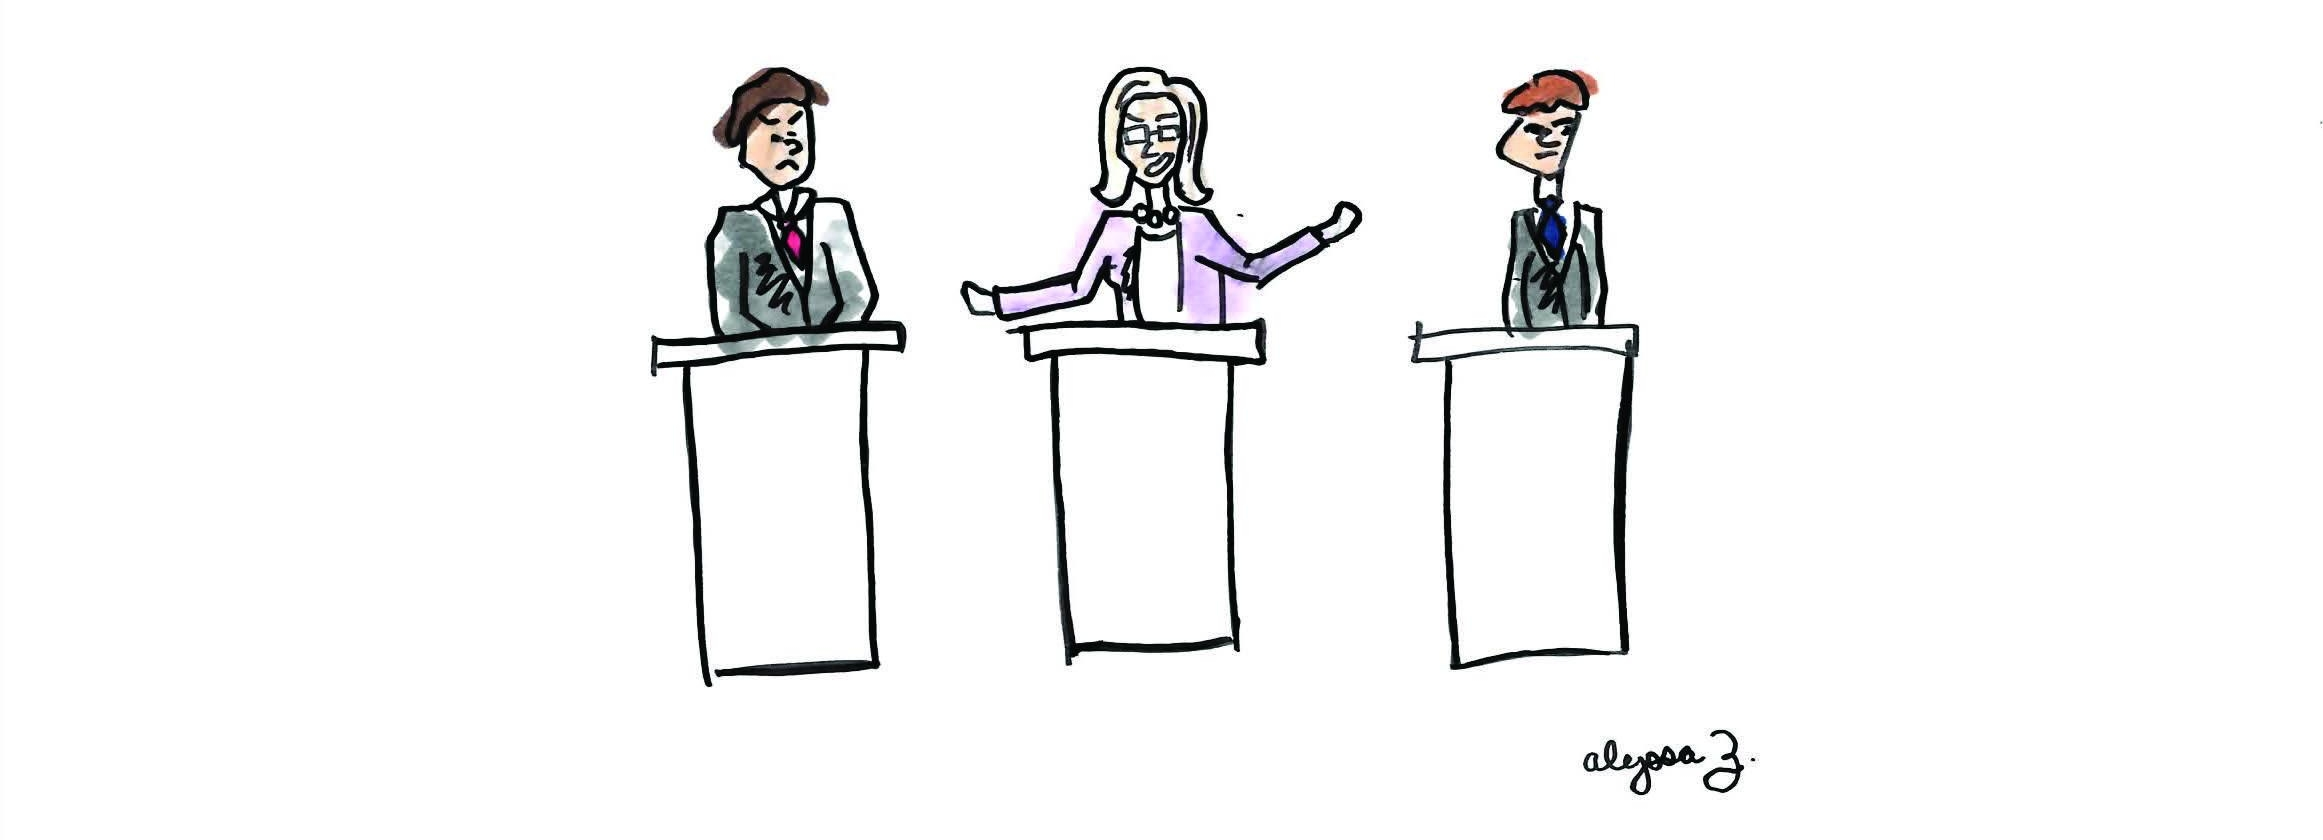 Alyssa Zavattero/Riverdale Review  Cartoon of a Student Debate Framed as a Presidential Debate.